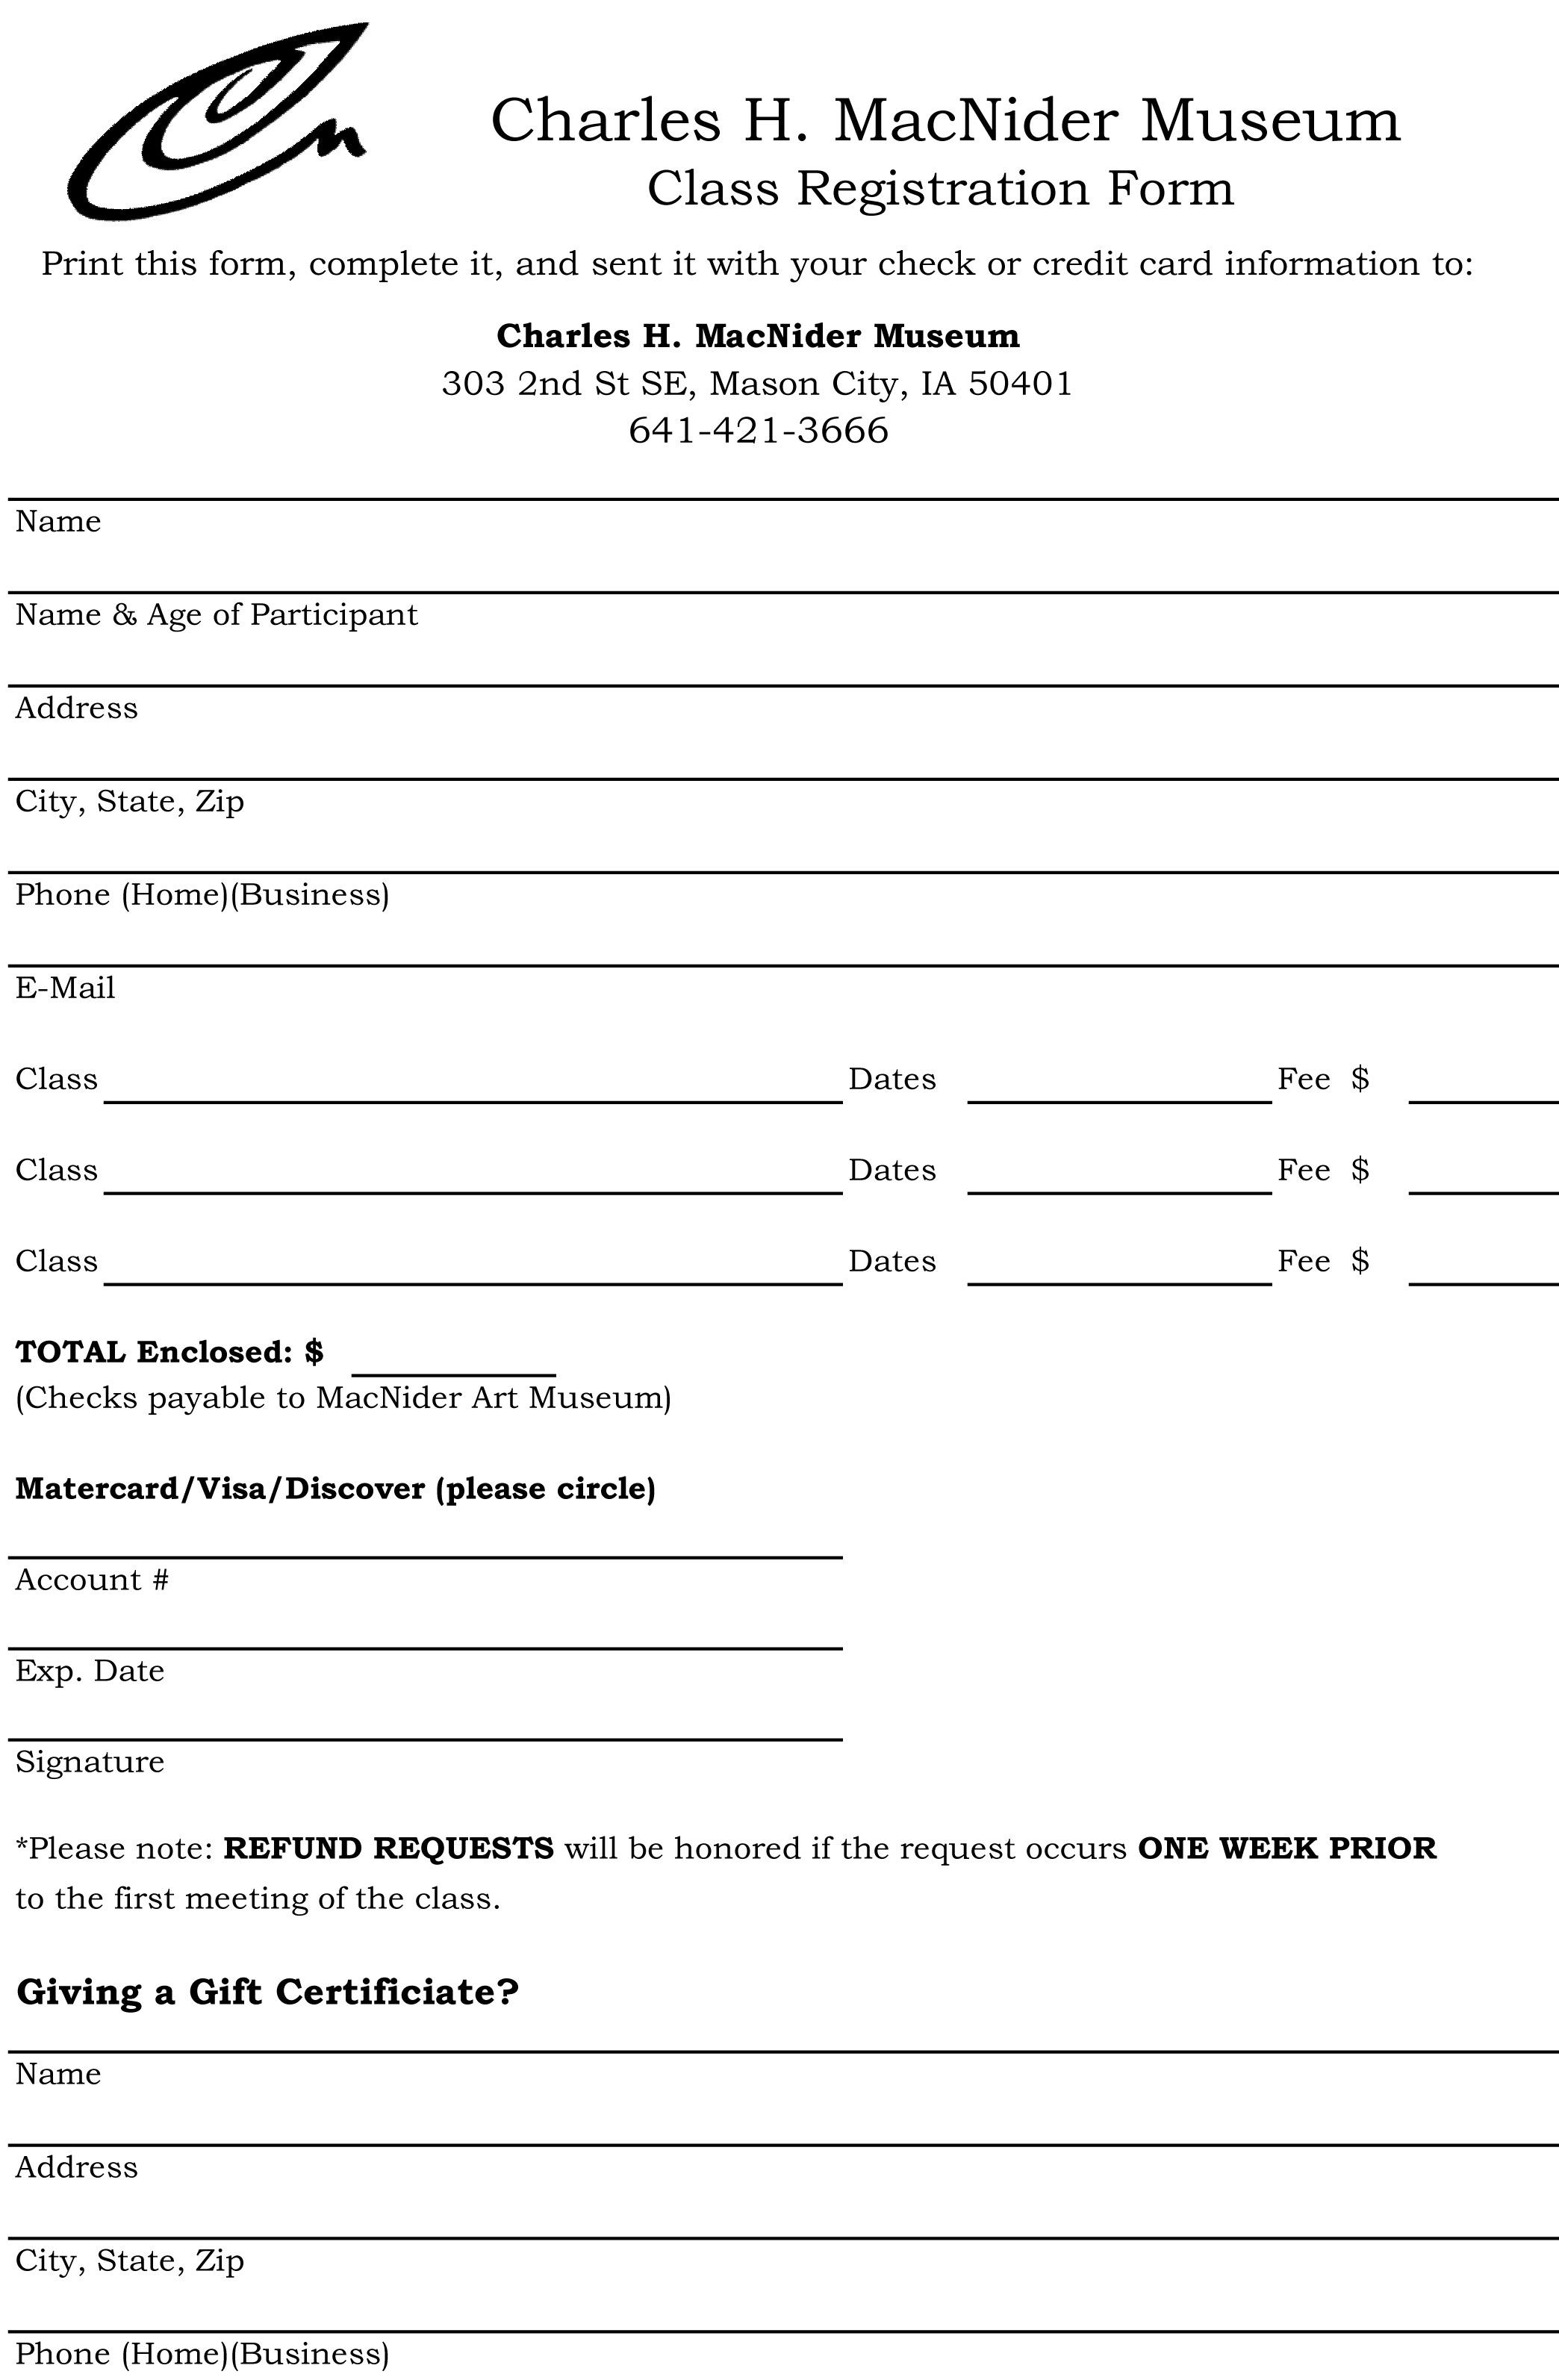 Class Registration Form.xls